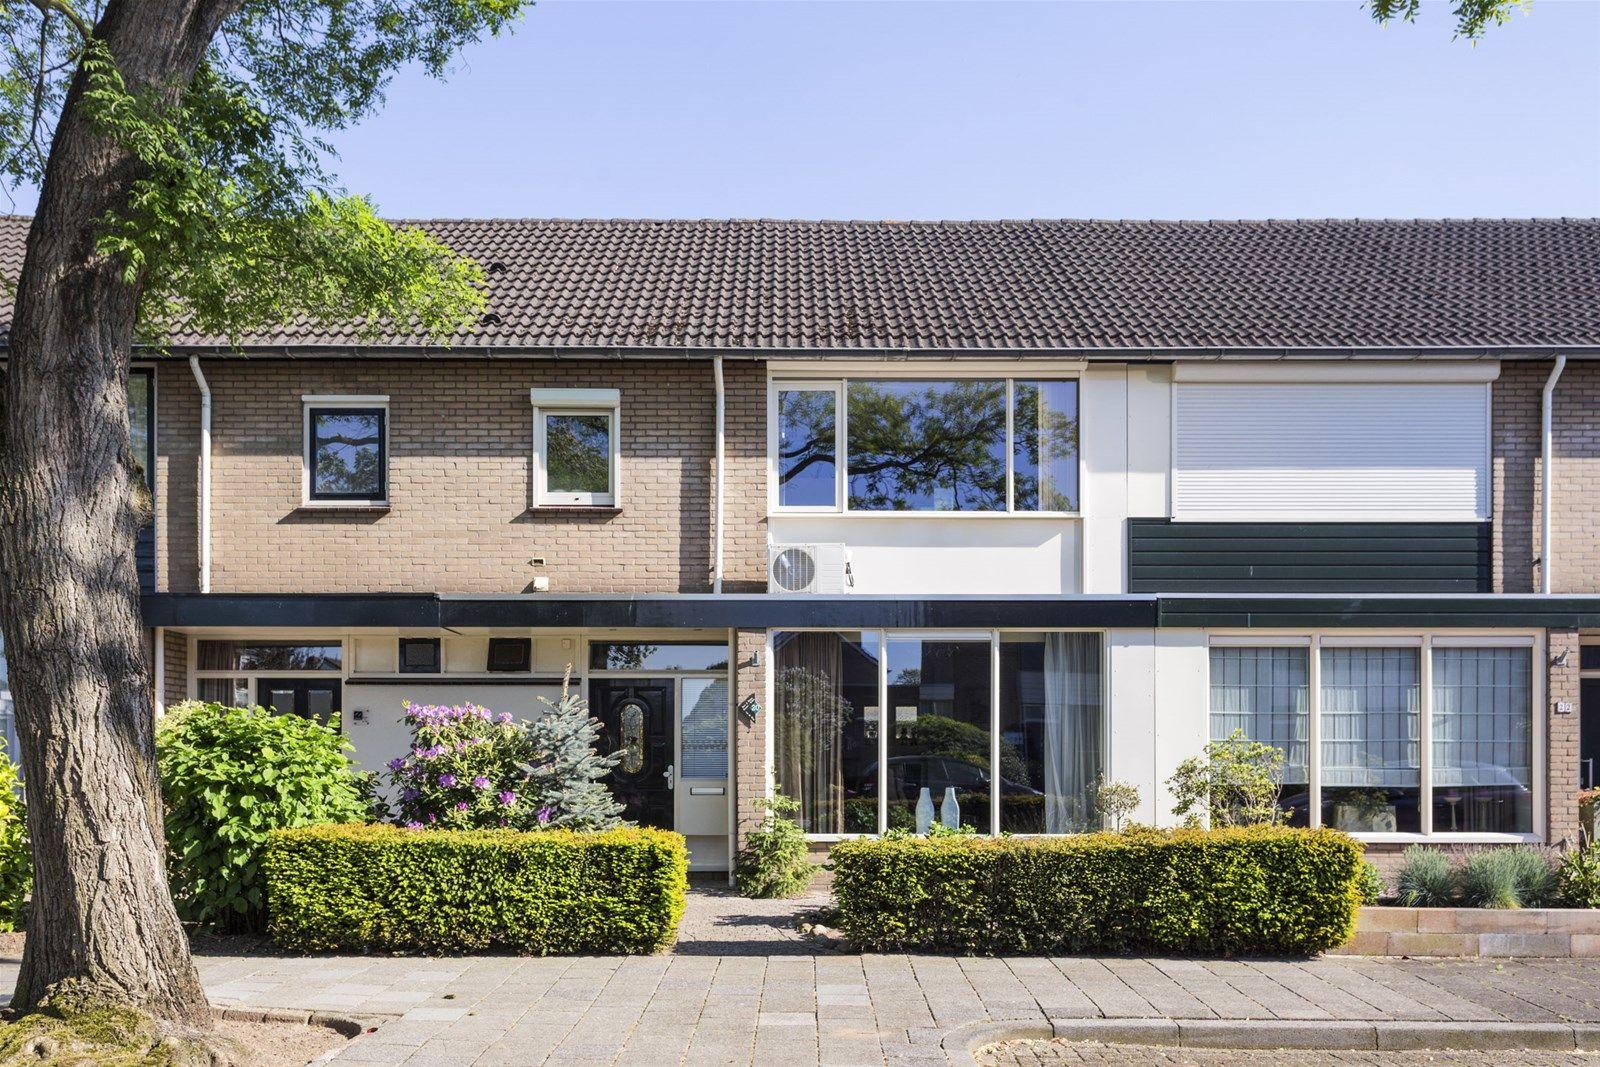 Seringenstraat 20, Rosmalen